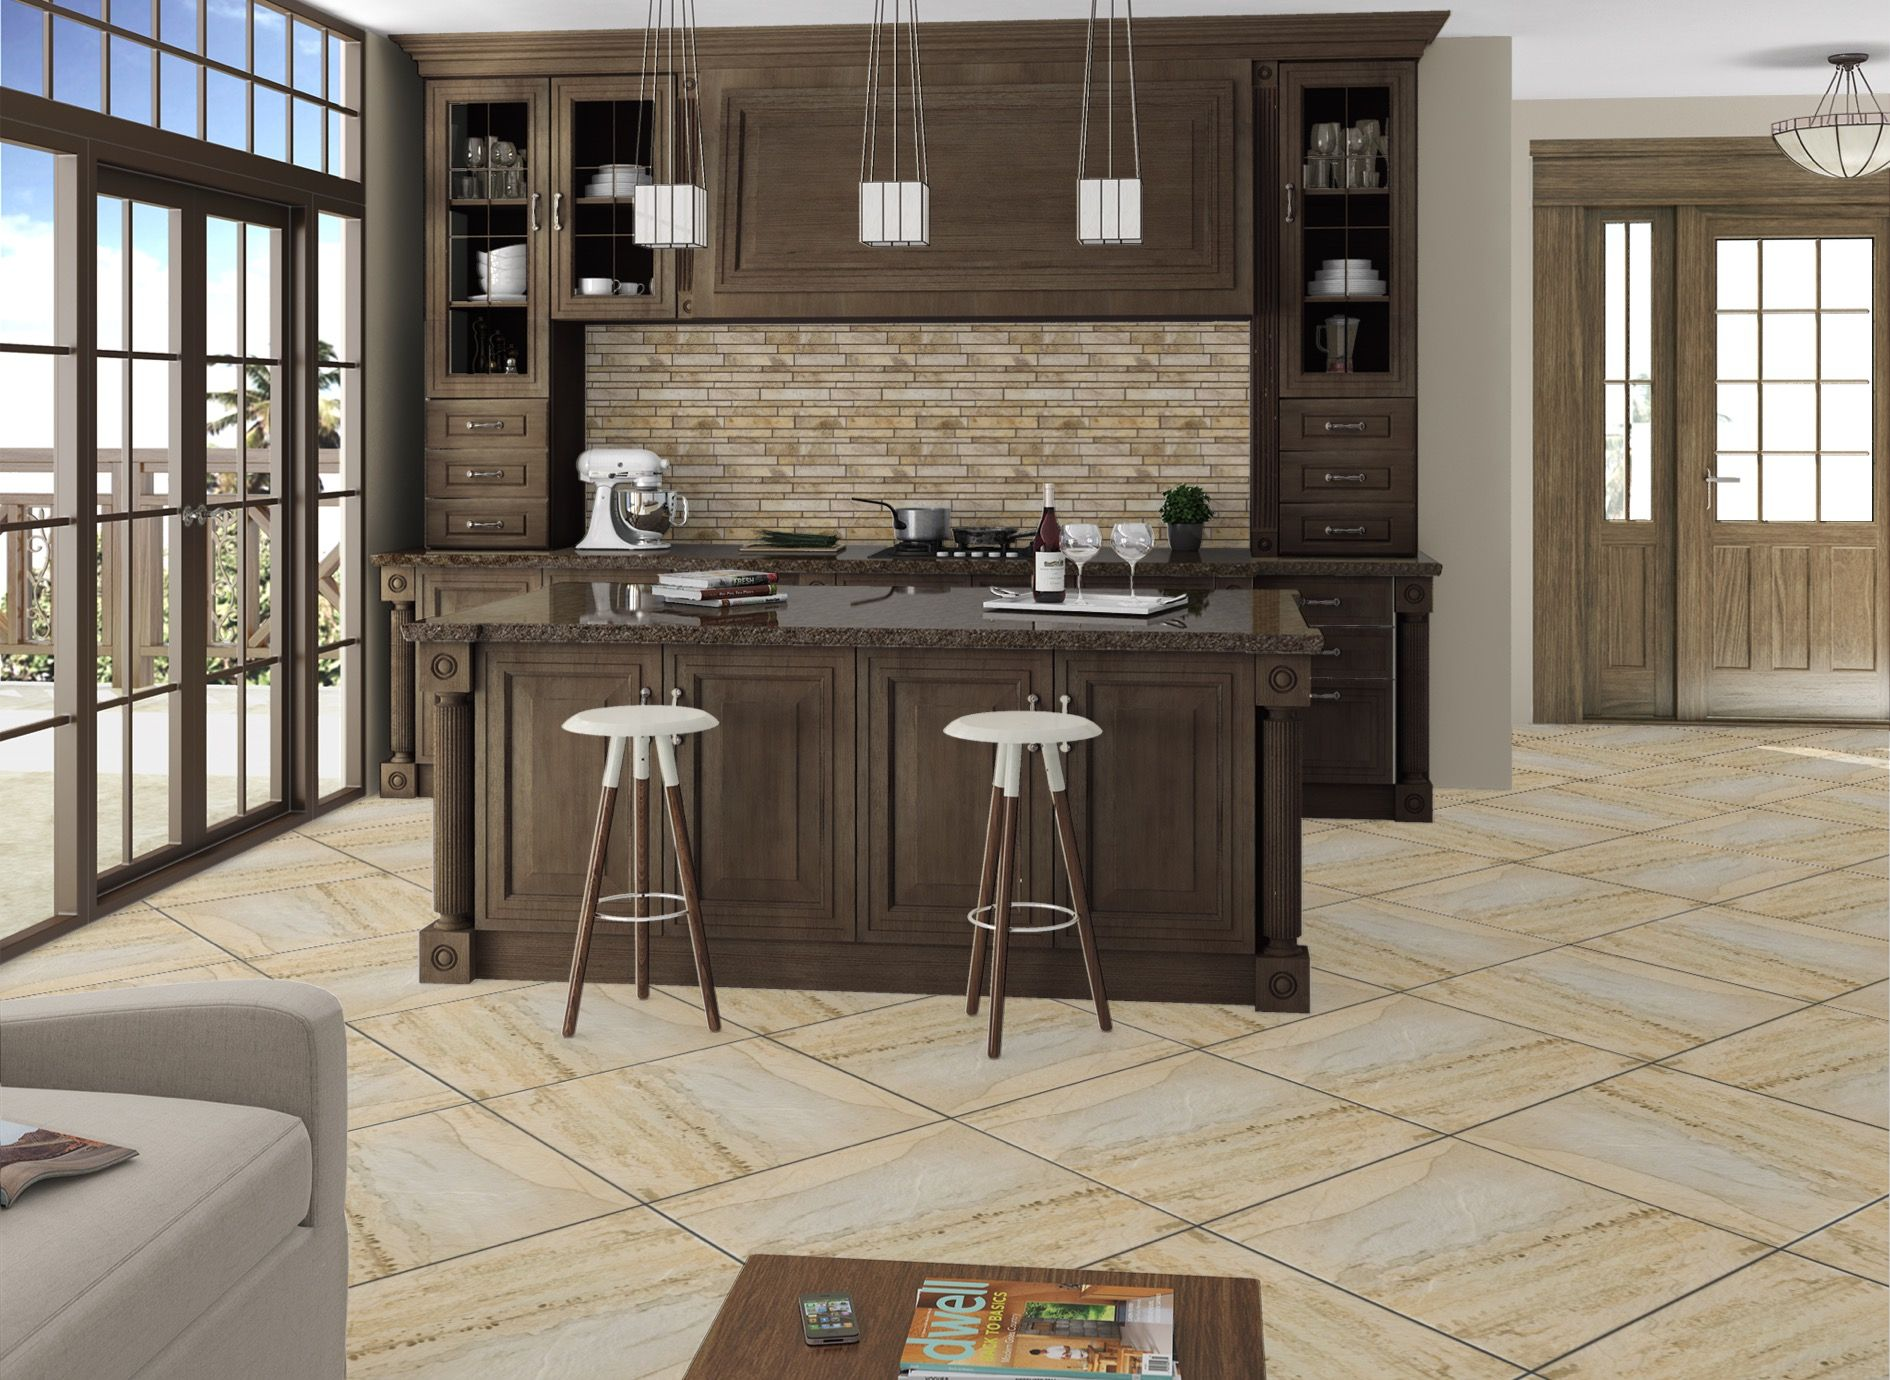 calabria linear mosaic kitchen backsplash designed using the arley tile design app kitchen on kitchen remodel apps id=49755